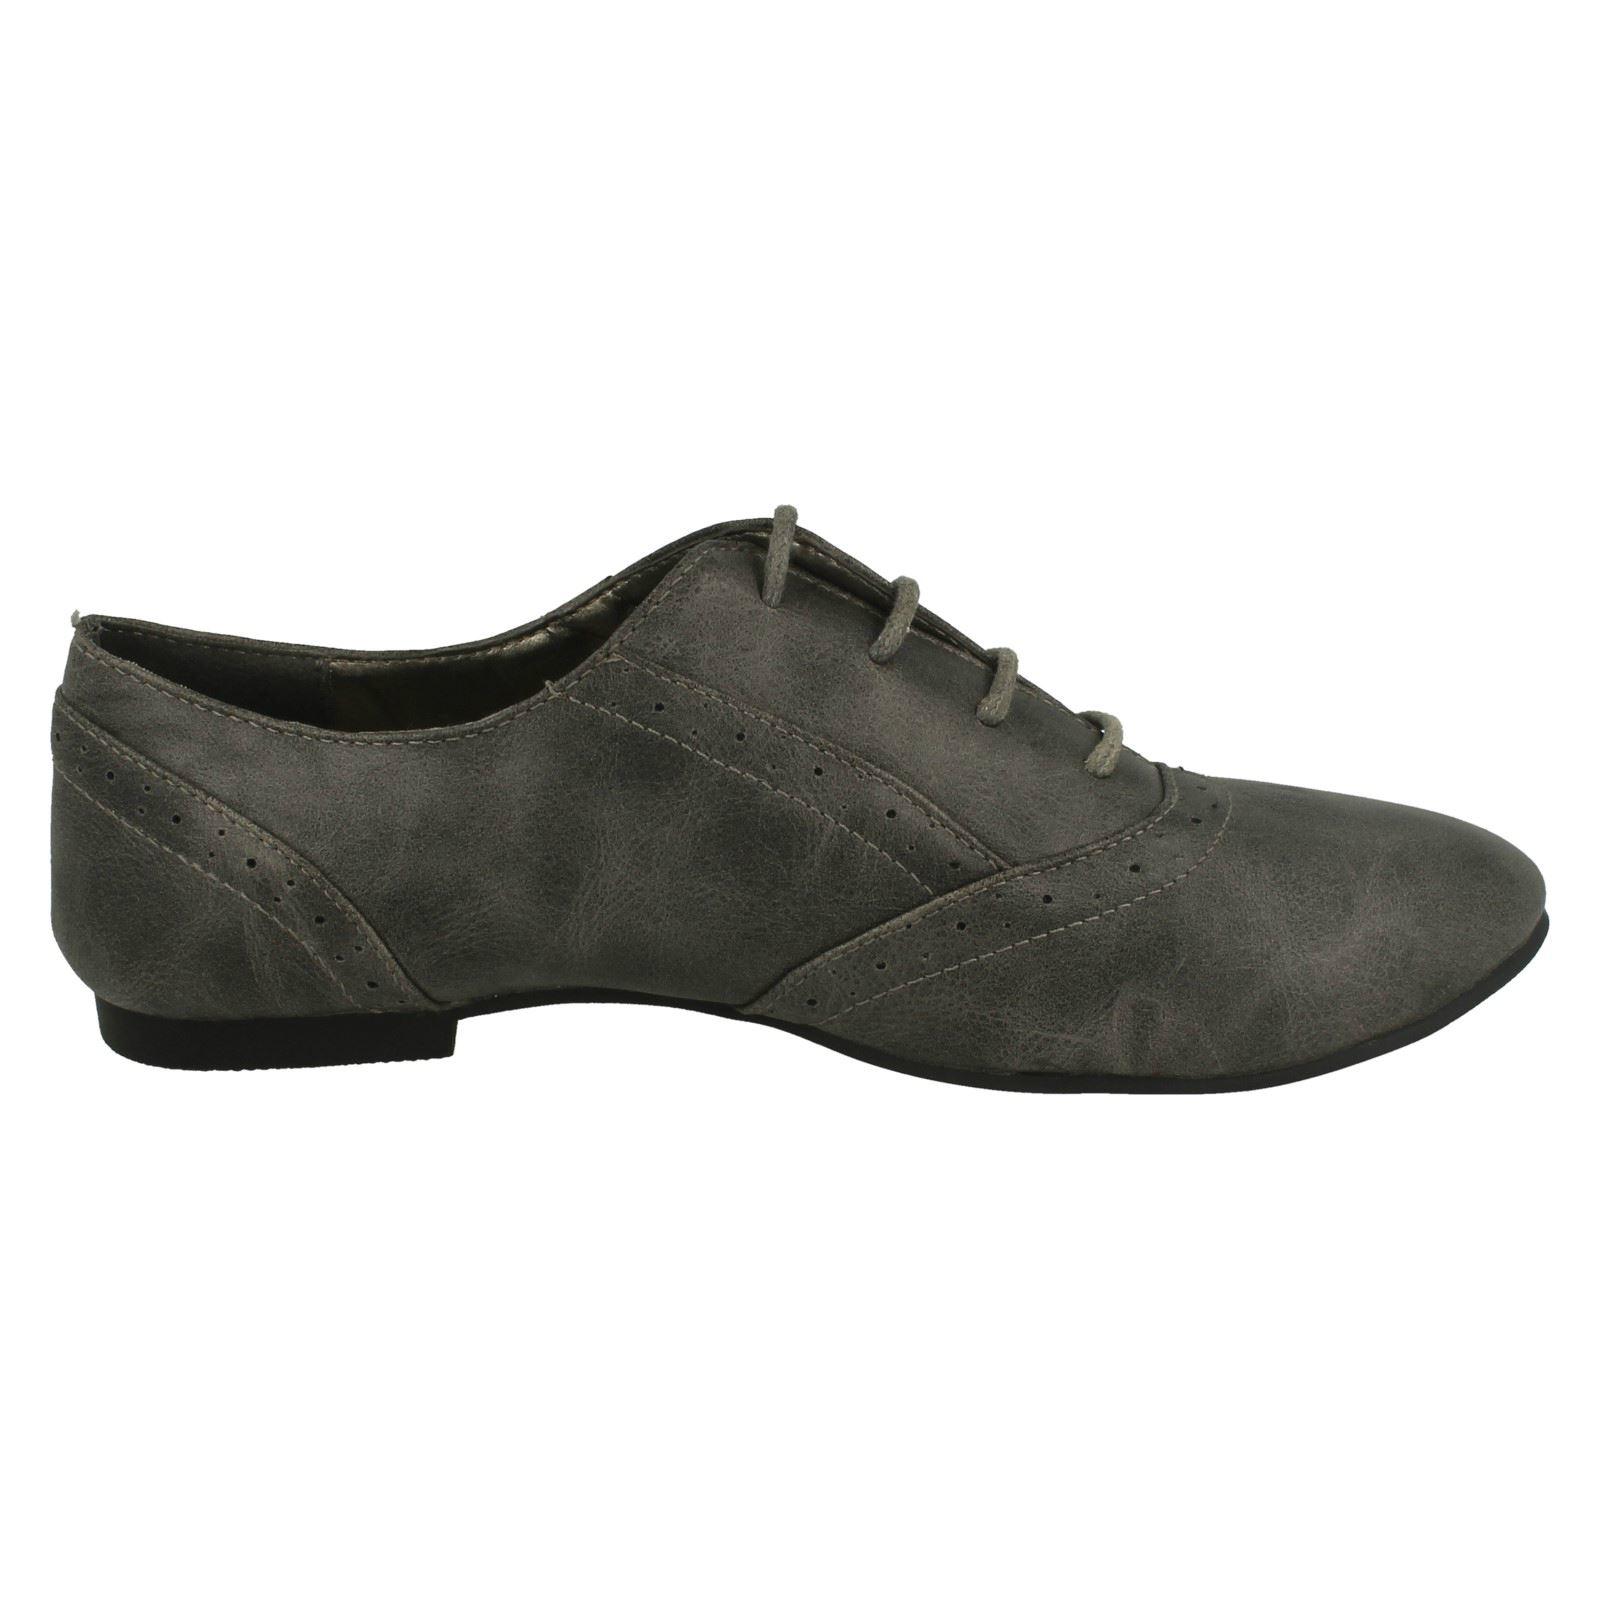 Señoras Encaje Estilo Zapato Plano mancha en